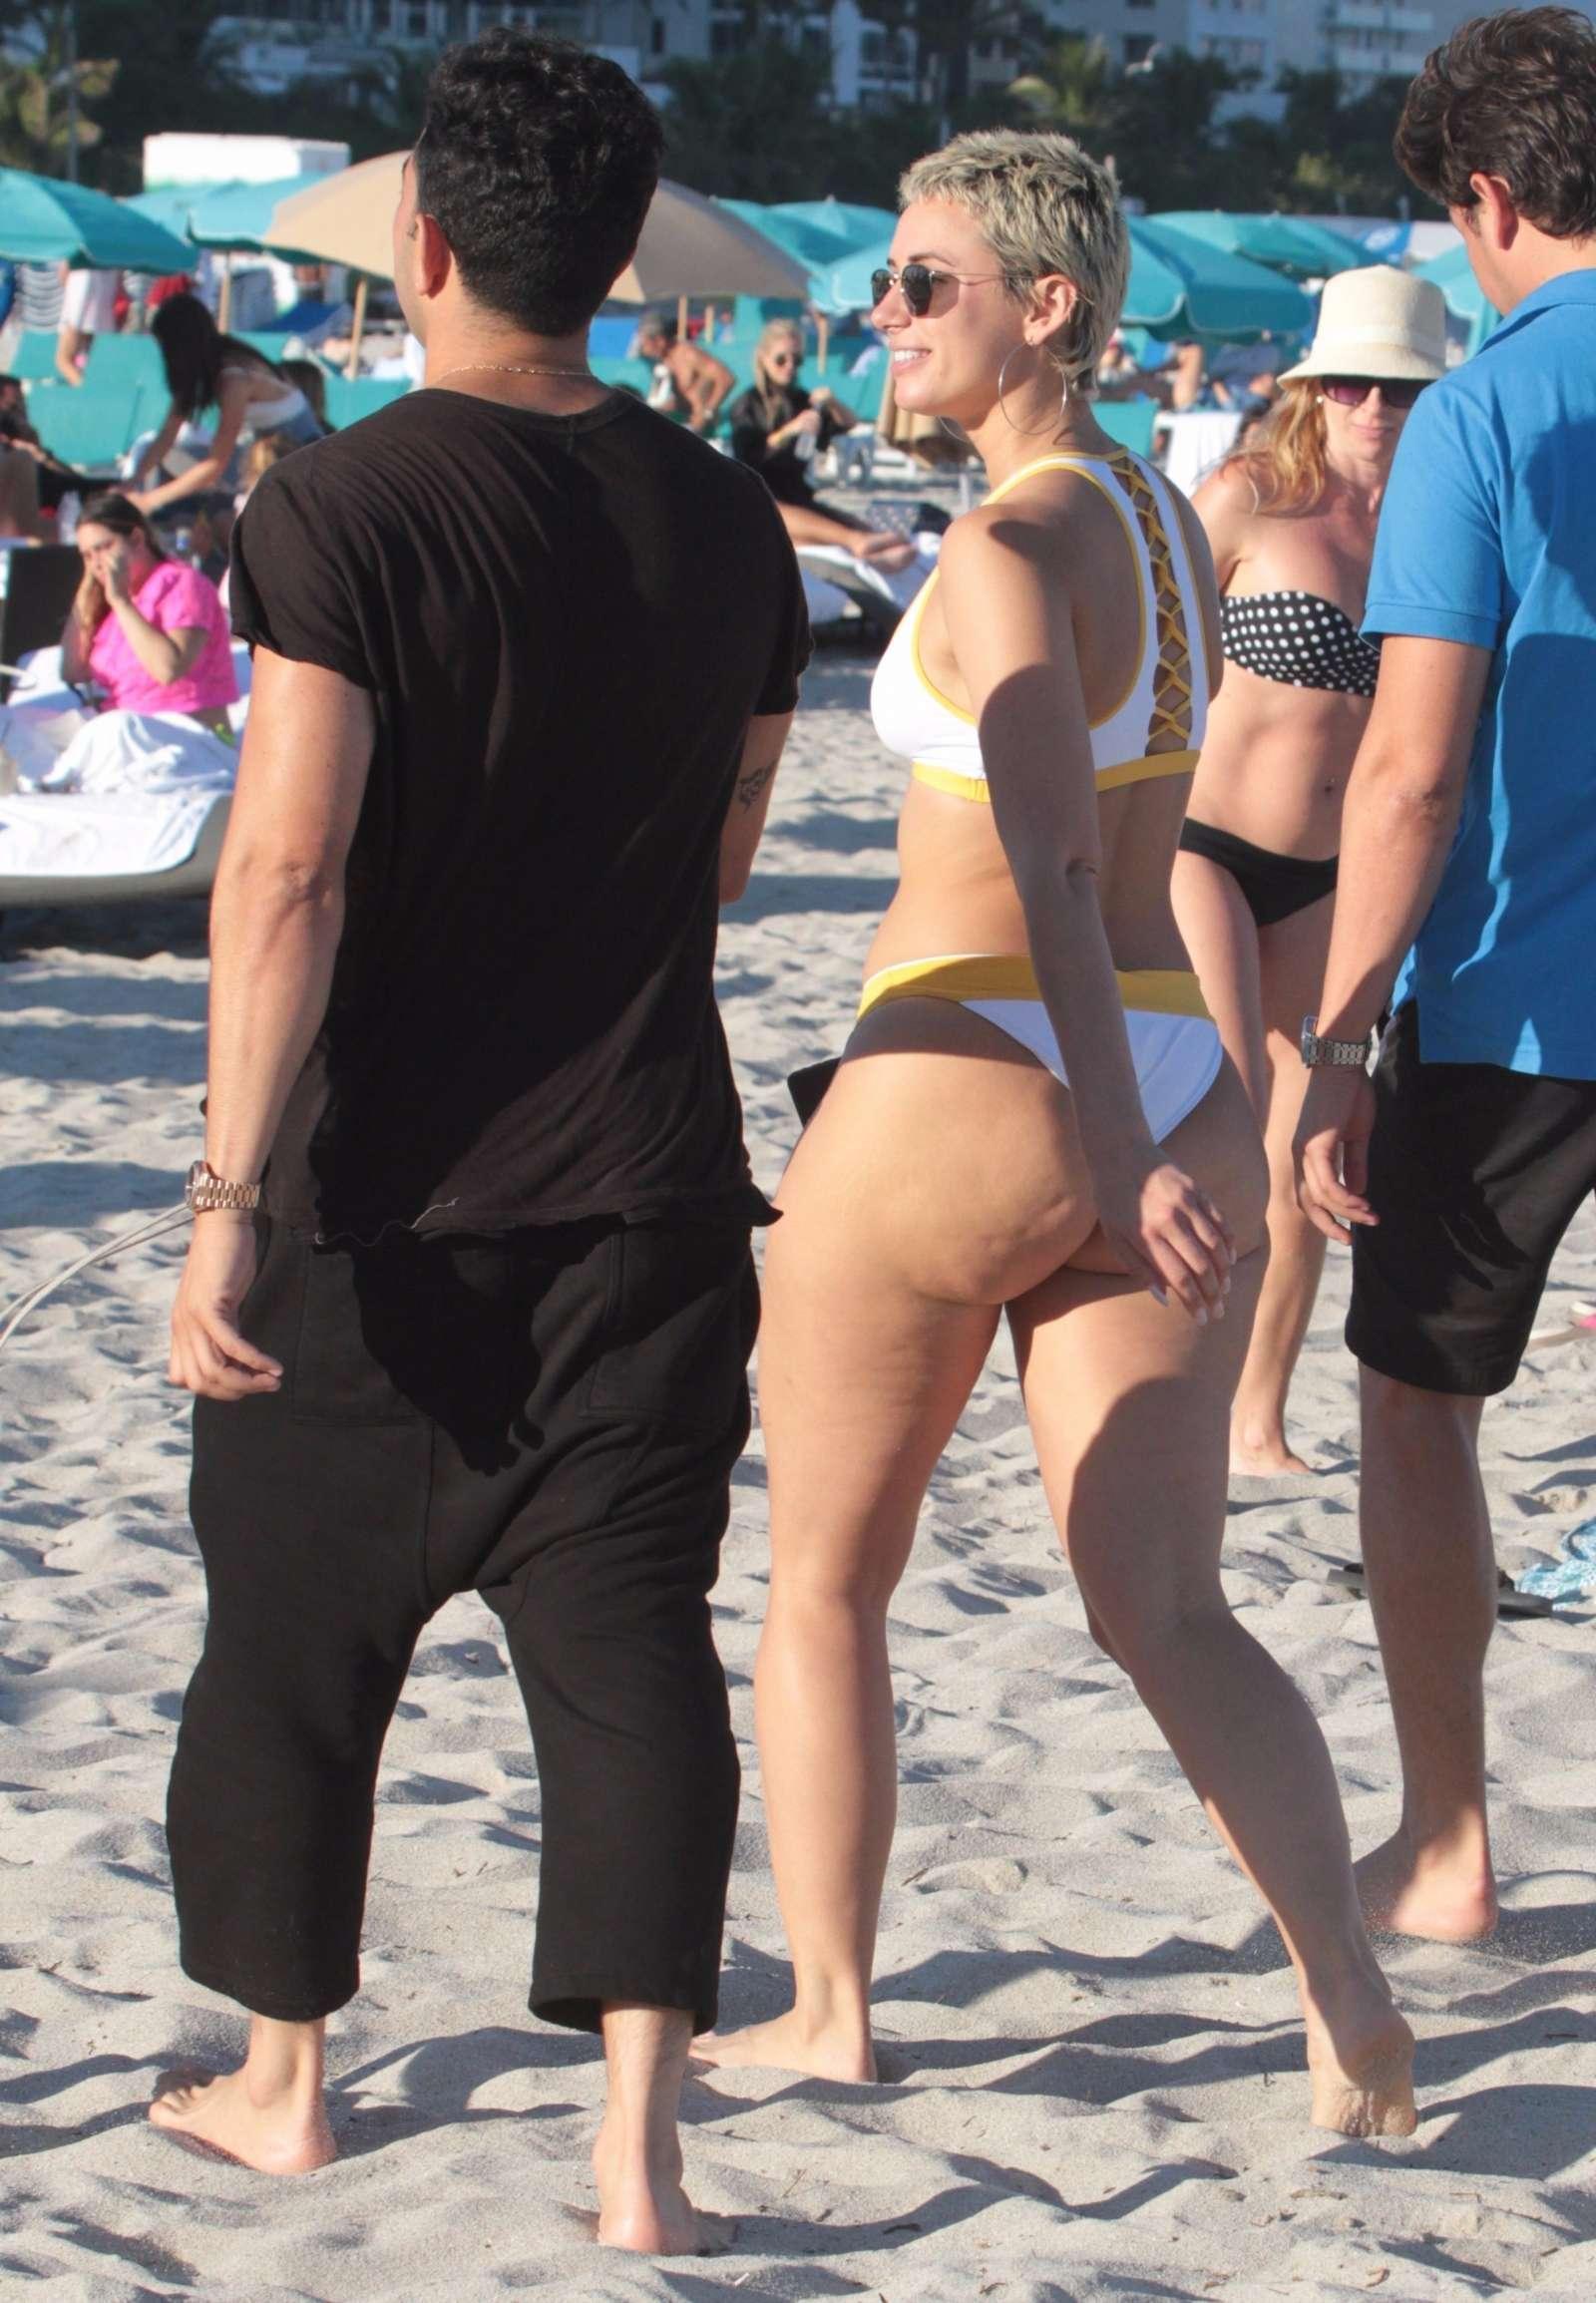 YesJulz in White Bikini on the beach in Miami Pic 33 of 35